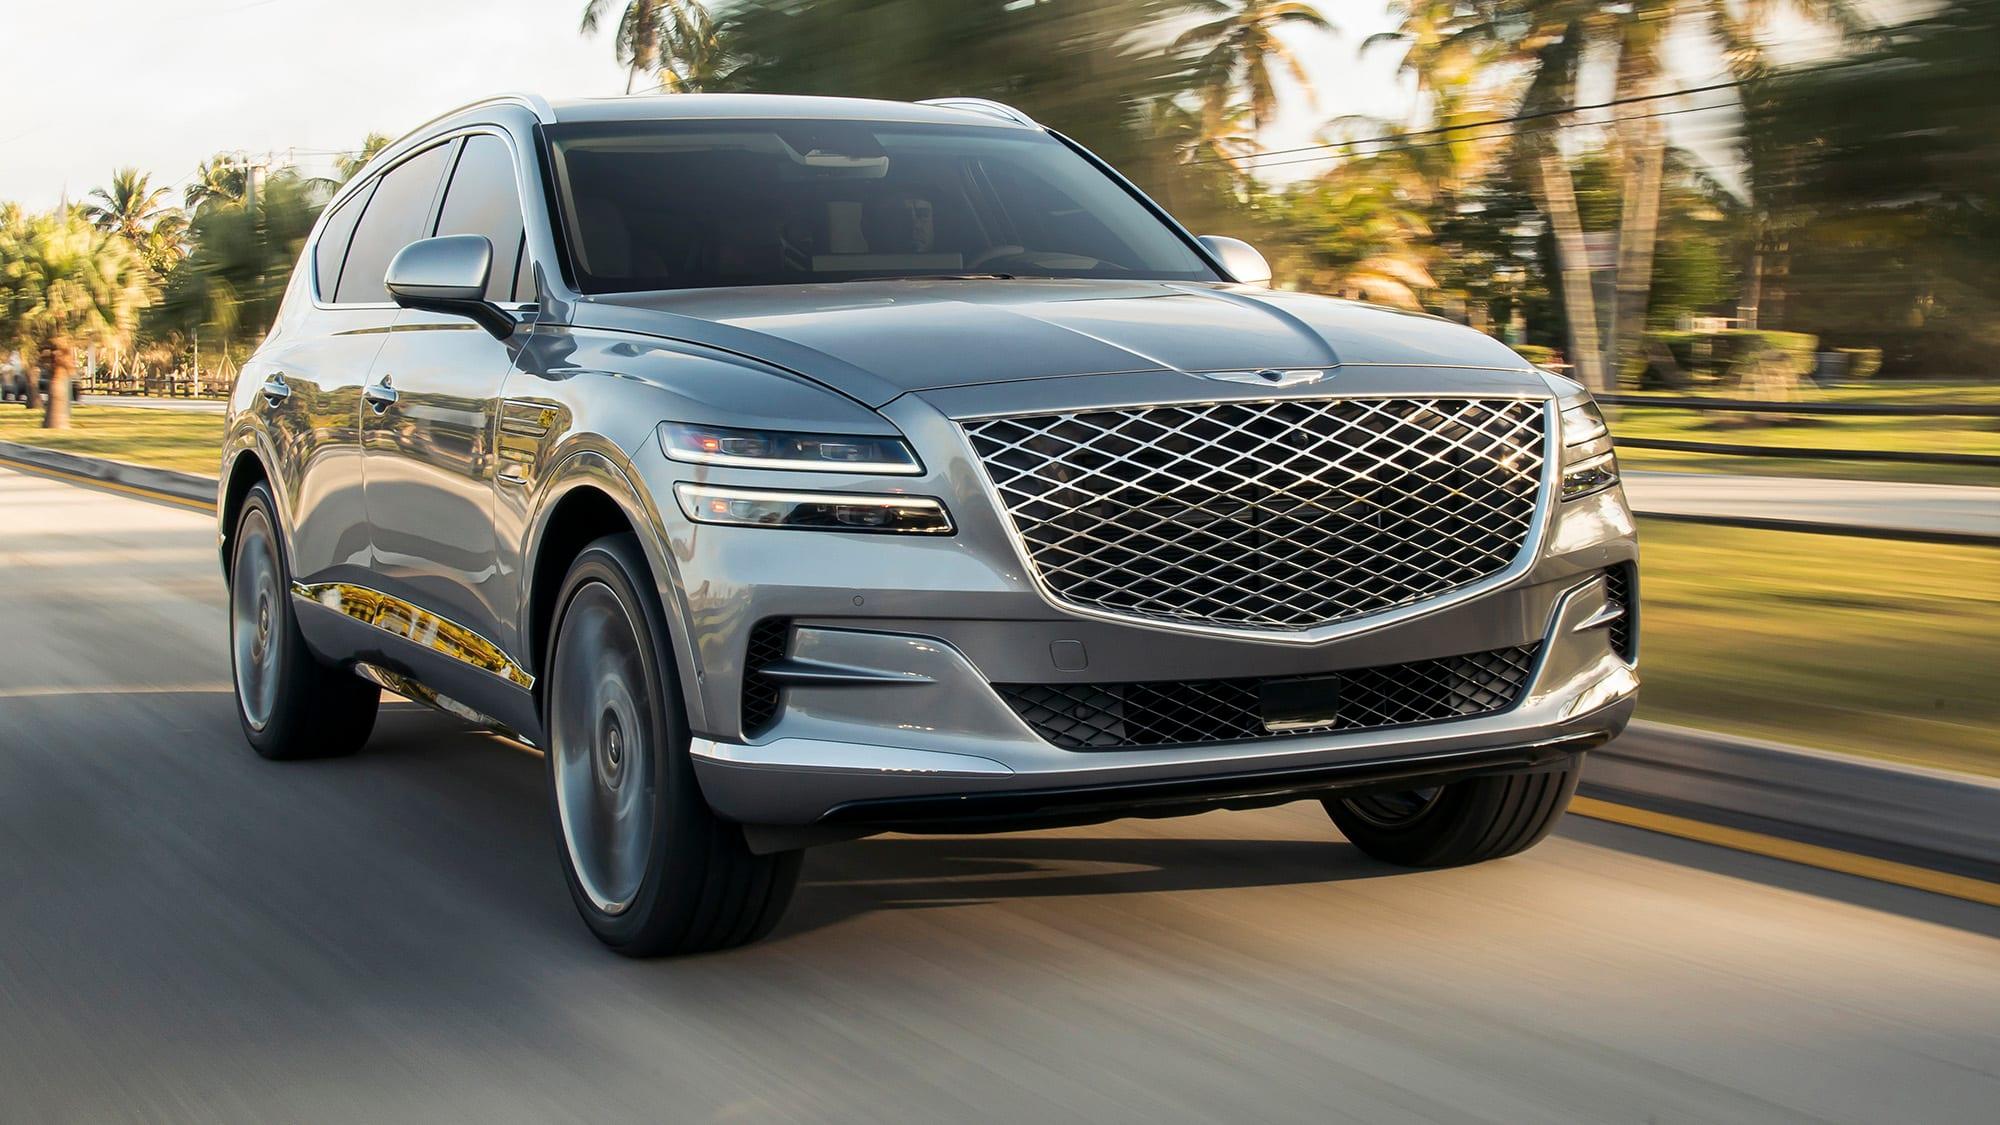 2021 Genesis Gv80 Price And Specs Luxury Suv On Sale October 2020 Caradvice